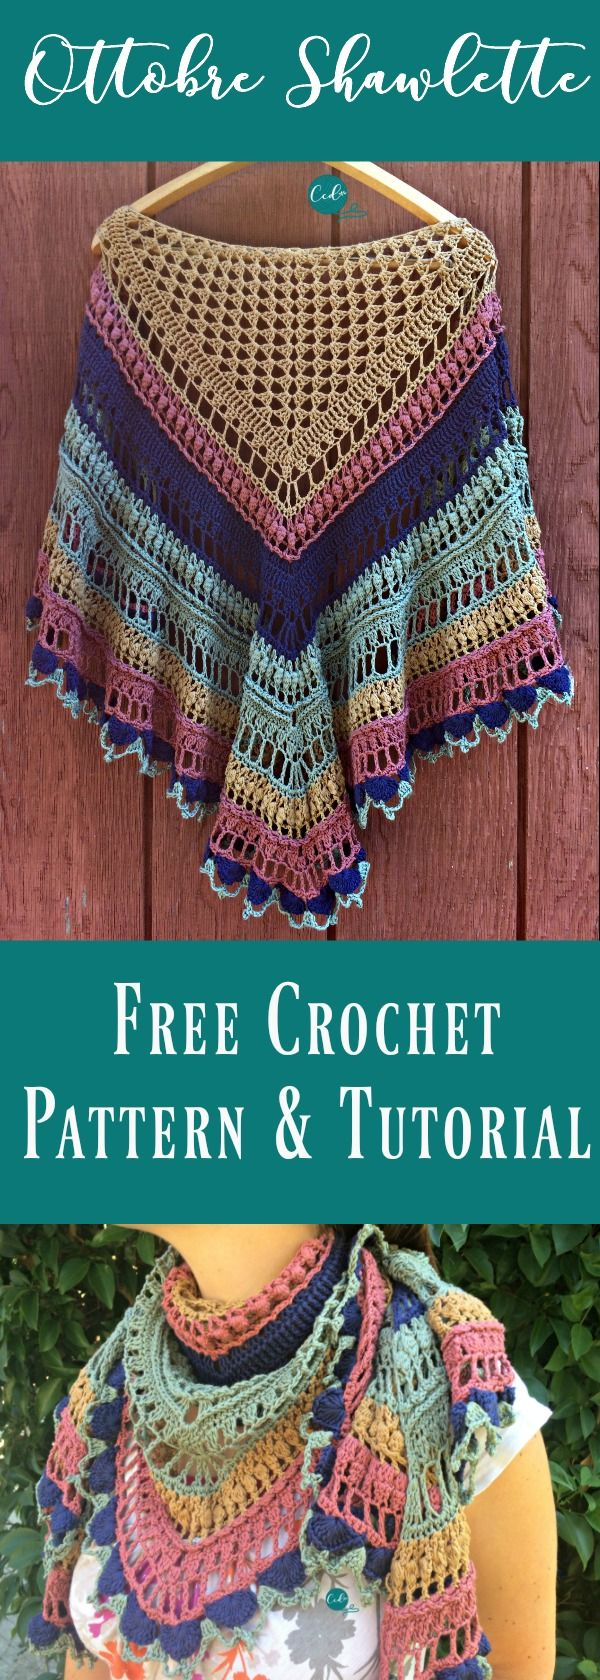 Ottobre Shawlette Free Crochet Pattern and Tutorial | Dreieckstuch ...